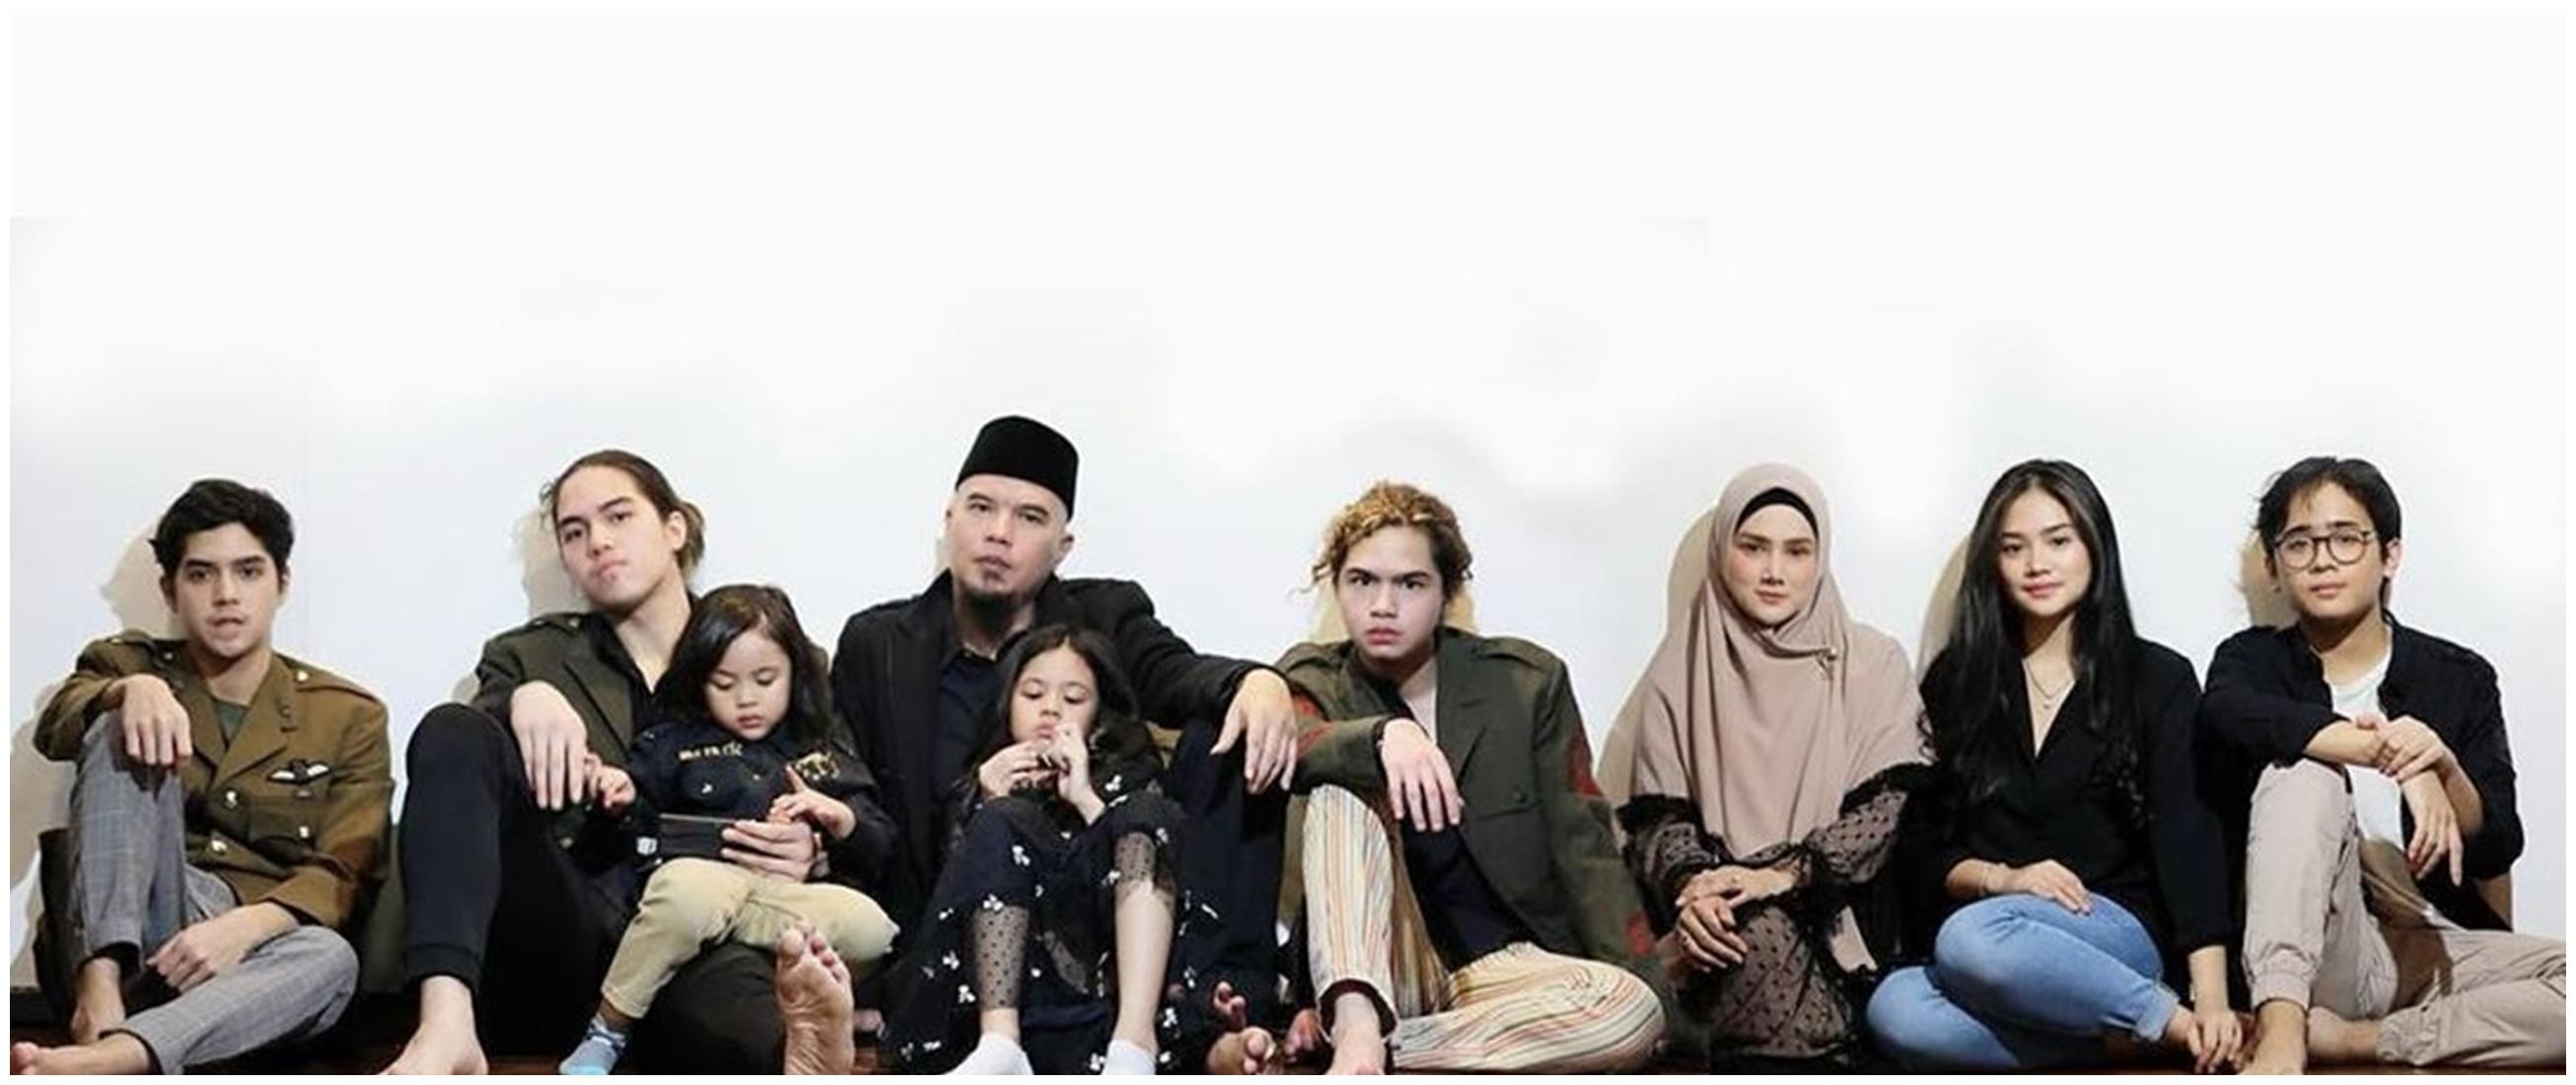 Ahmad Dhani unggah foto anak, komentar Dul Jaelani bikin salah fokus